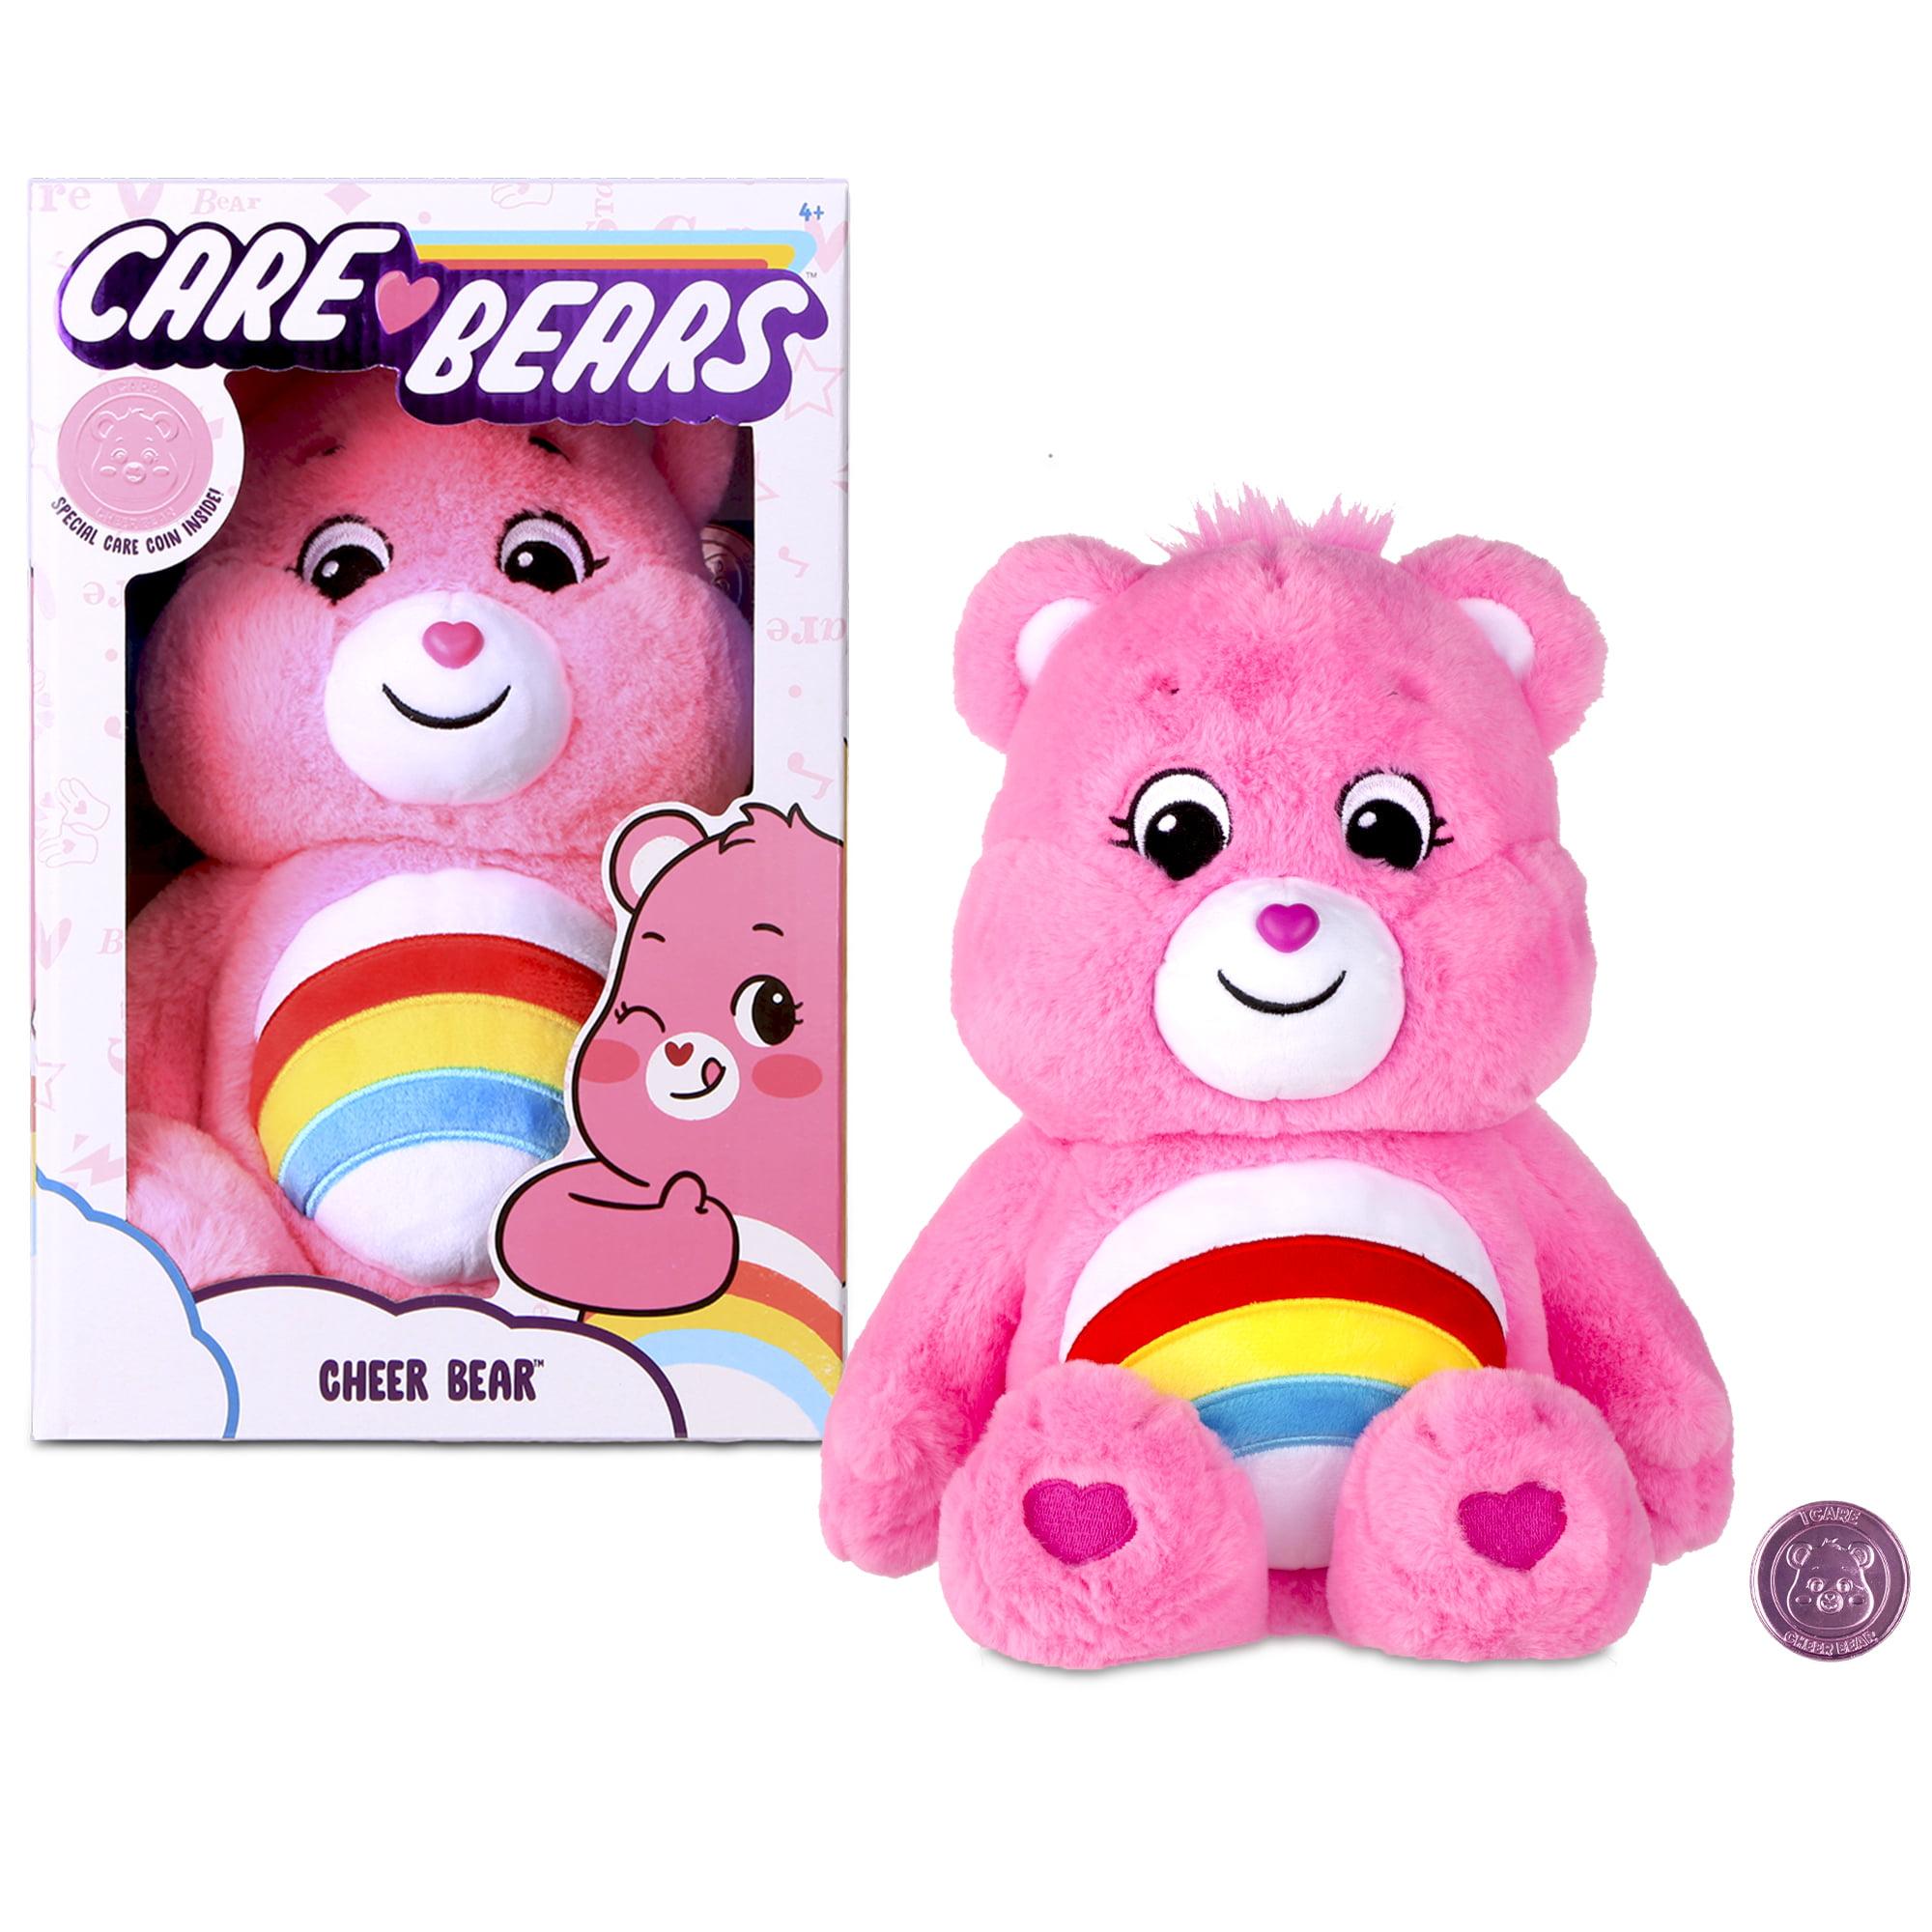 "NEW 2020 Care Bears - 14"" Plush - Cheer Bear - Soft Huggable Material! - Pink"